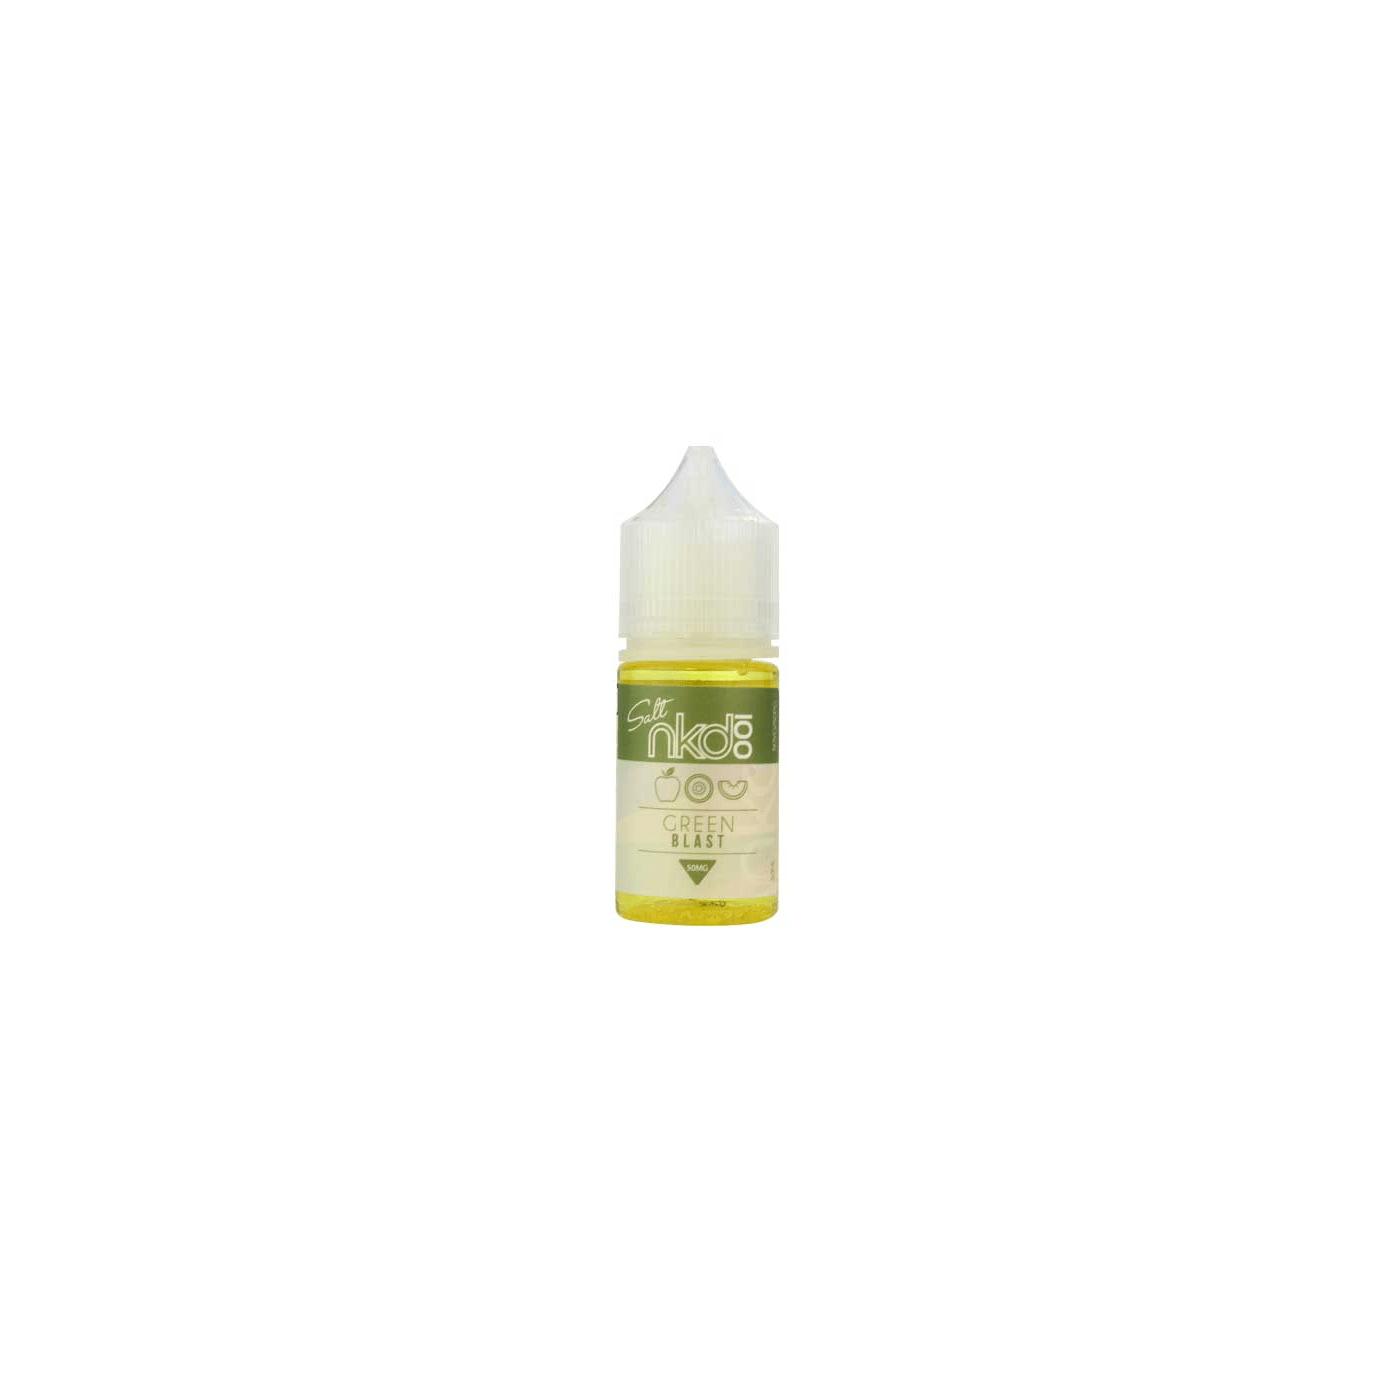 Naked 100 Salt Green Blast E-Liquid 30ml